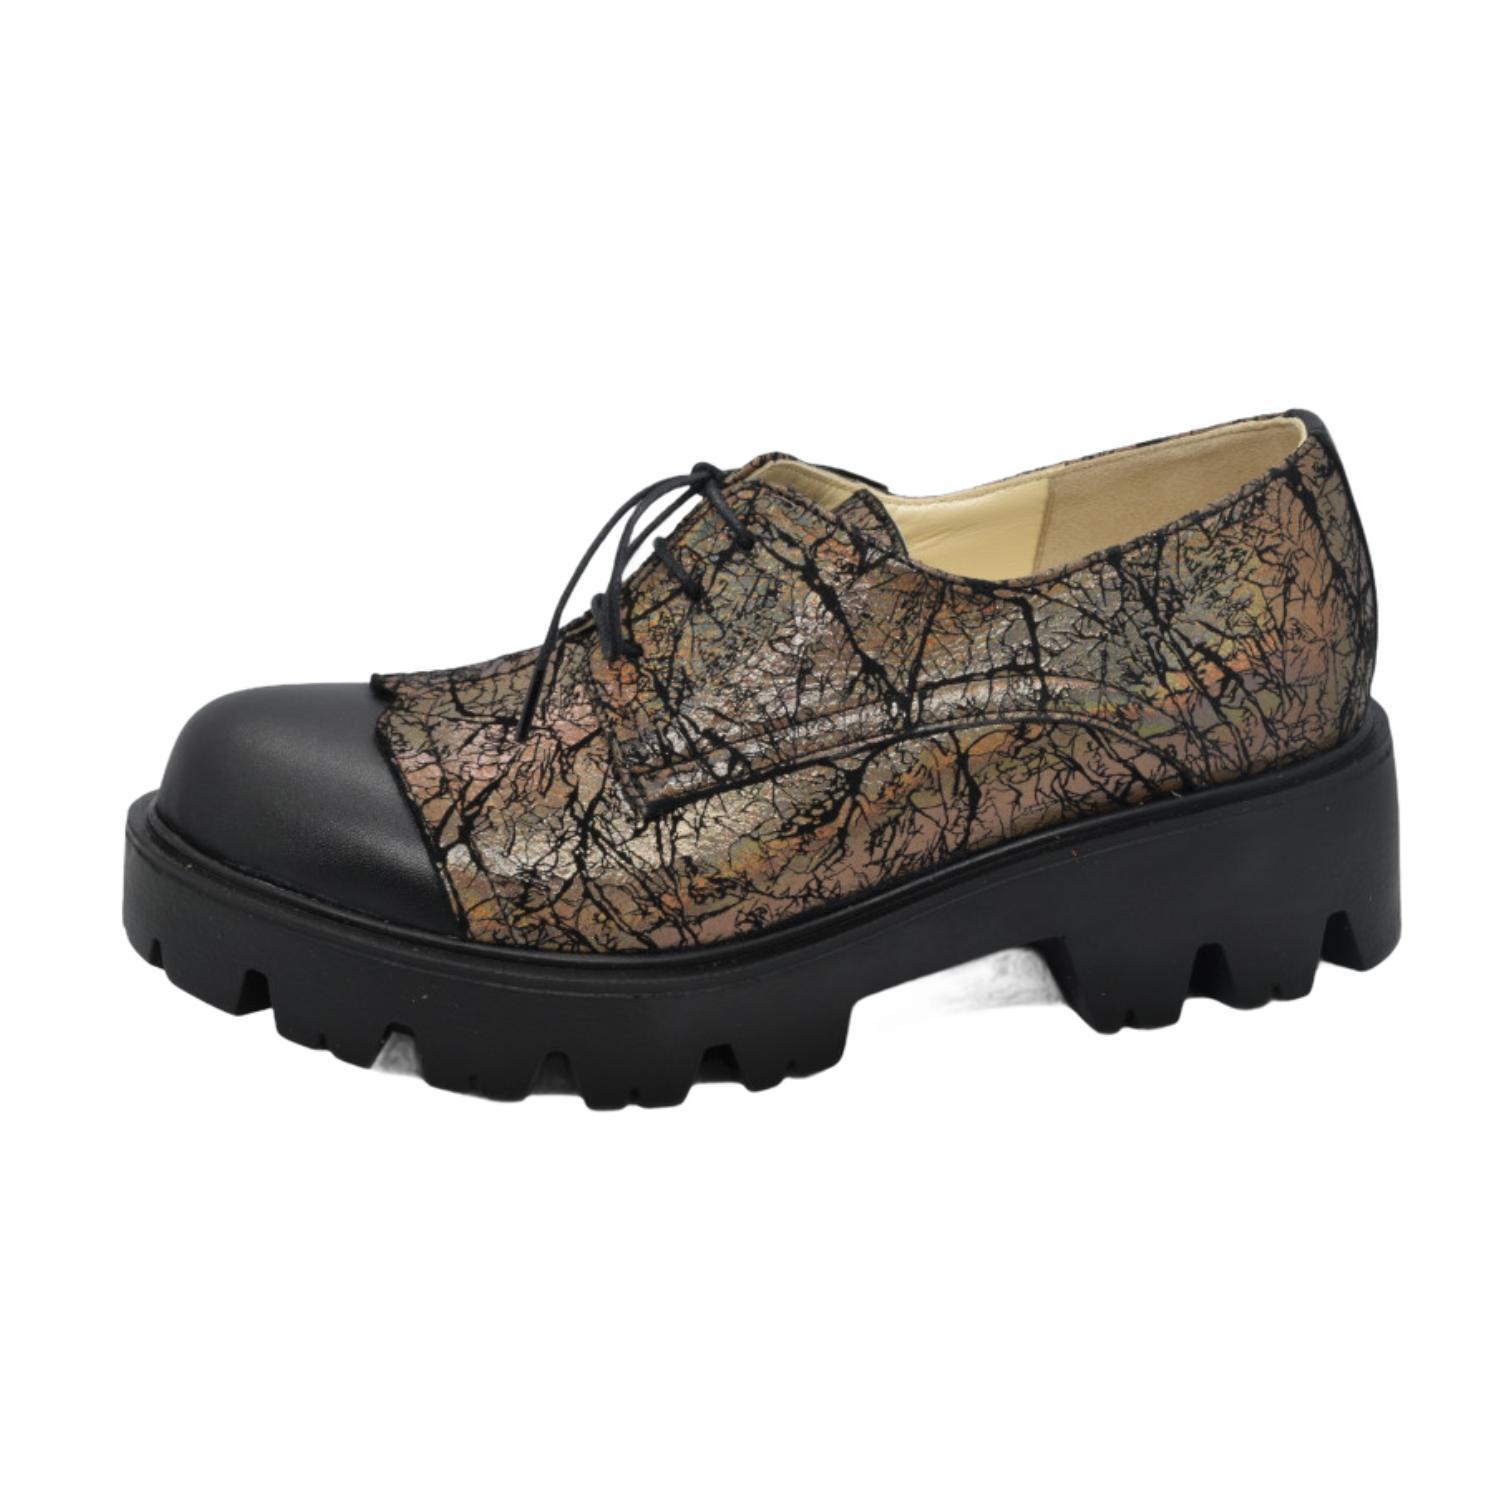 Pantofi negri combinati cu piele aramie